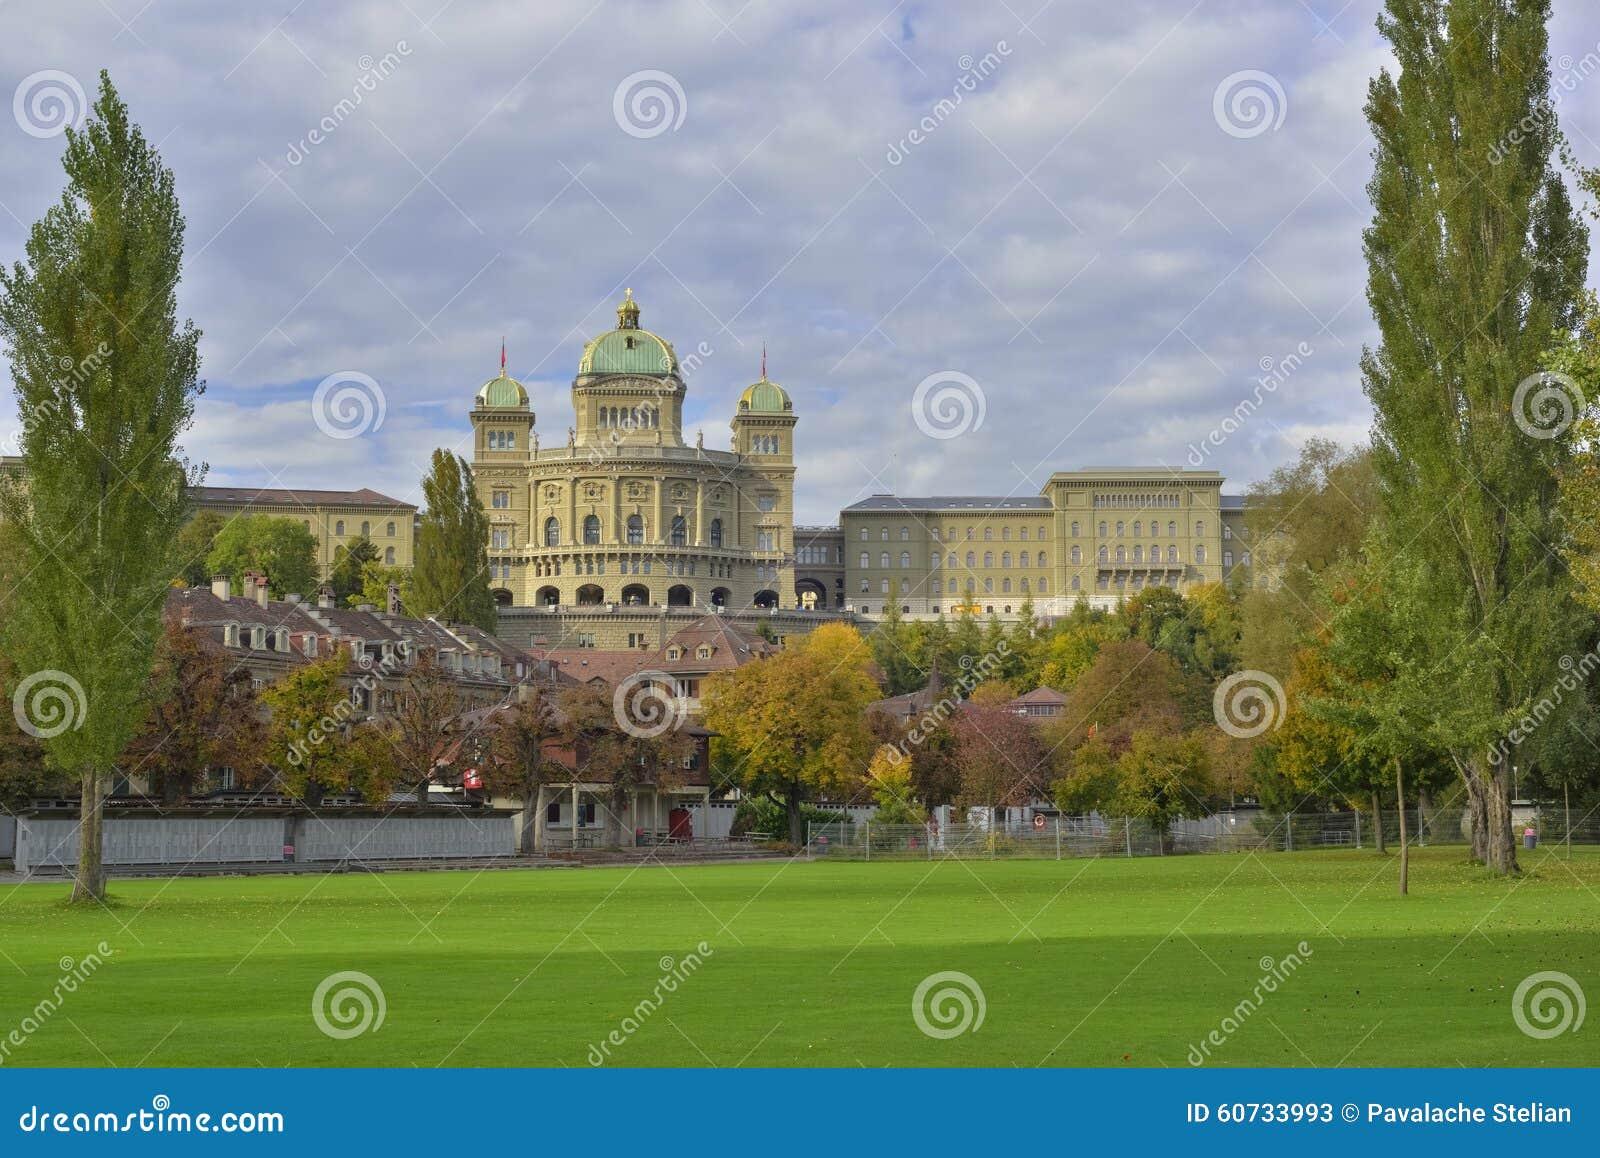 BundesHause (Parlamento della Svizzera) da Freibad Marzili berna switzerland